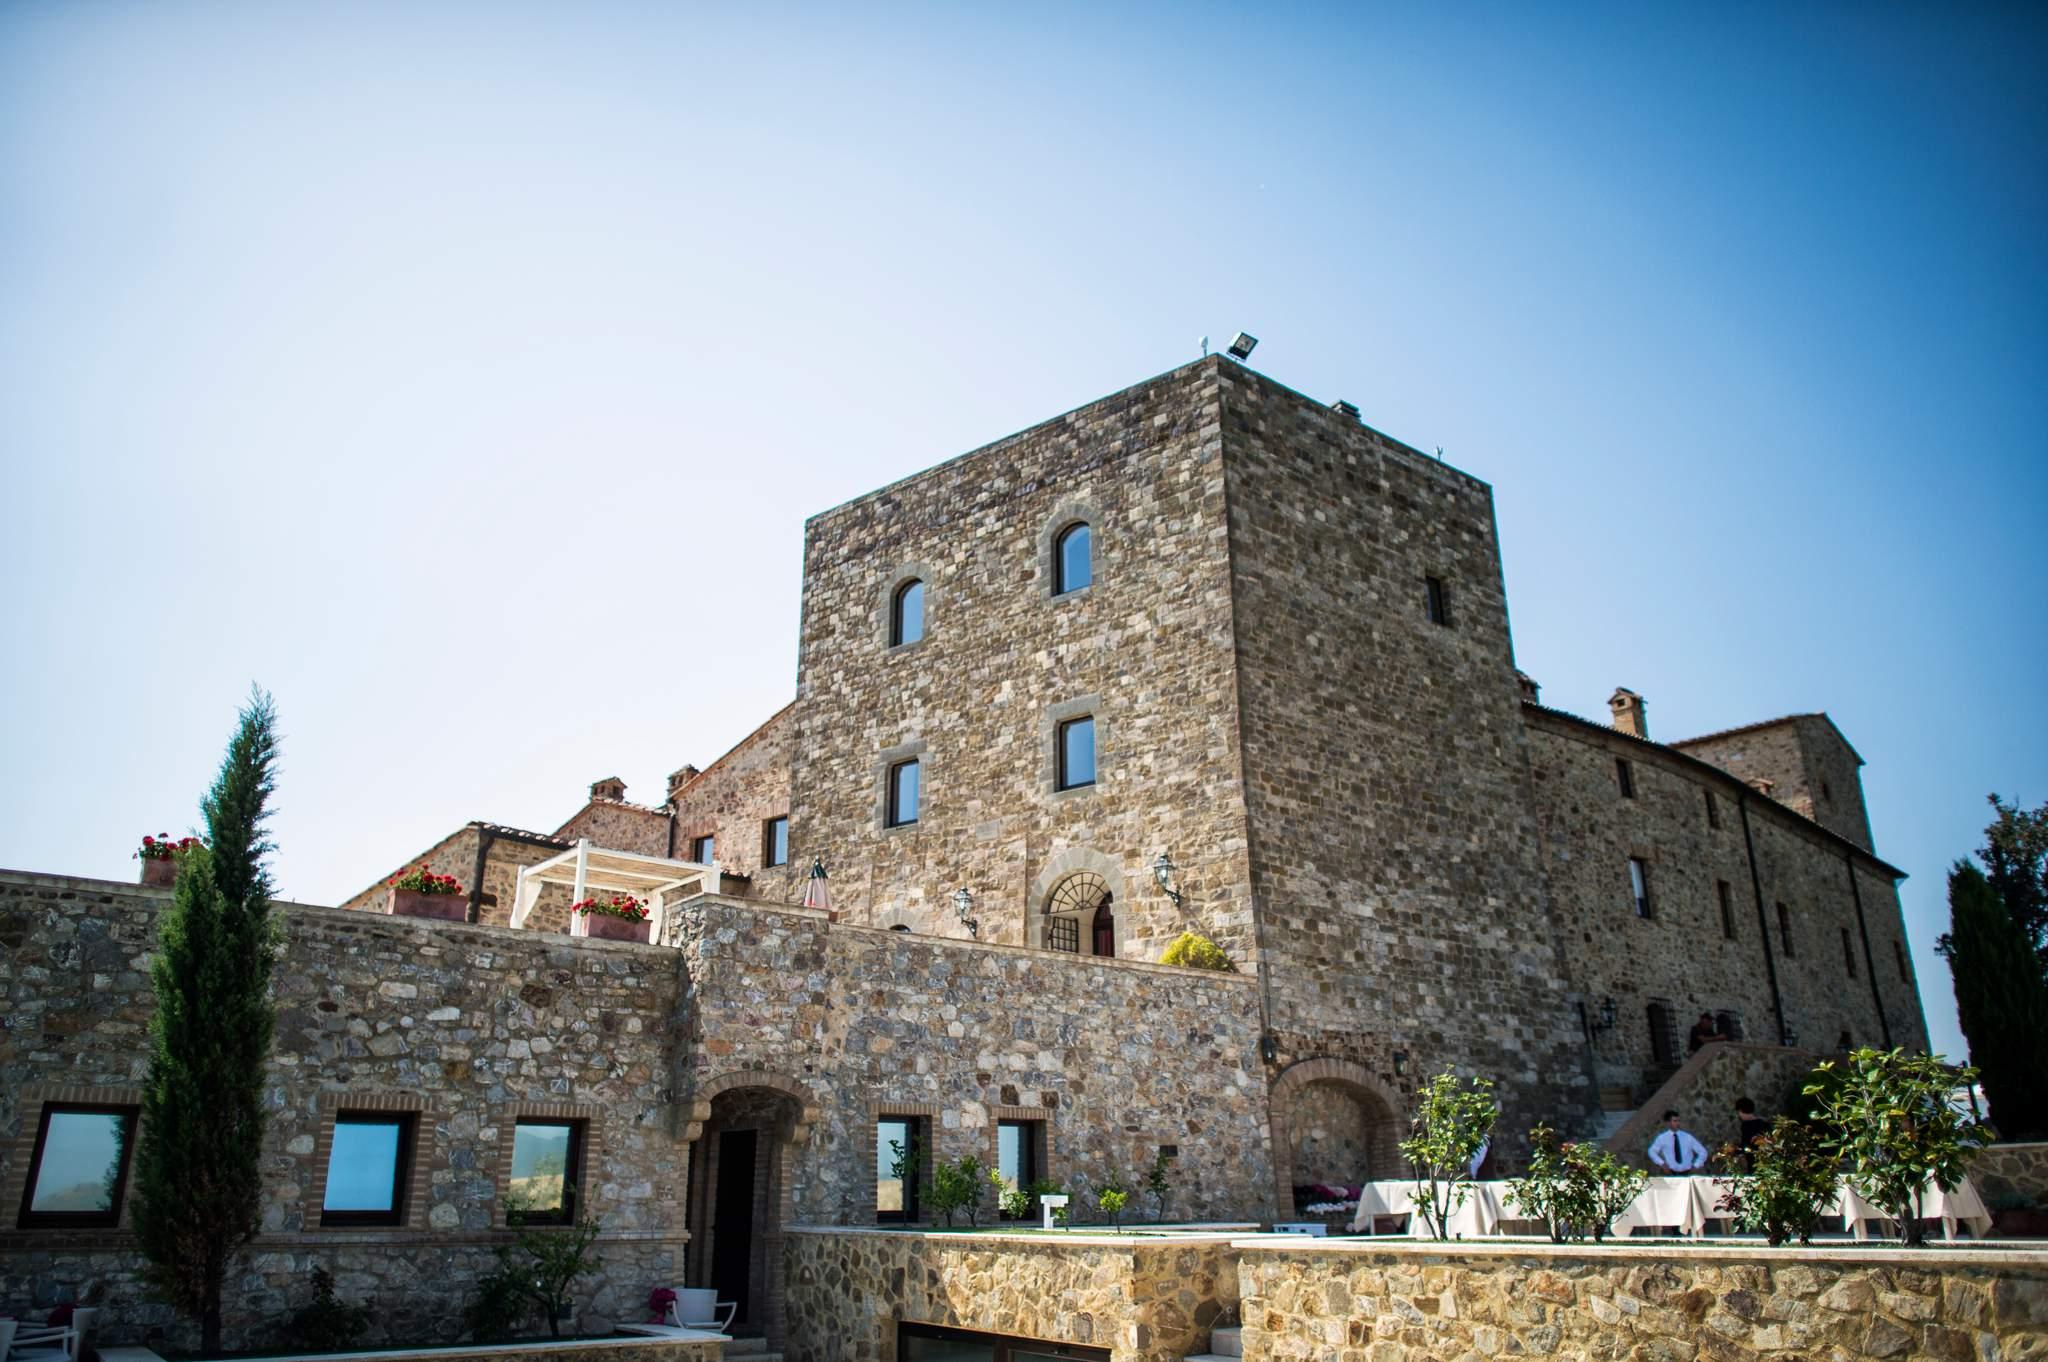 Matrimonio Toscana Castello : Renata fred matrimonio castello di velona montalcino